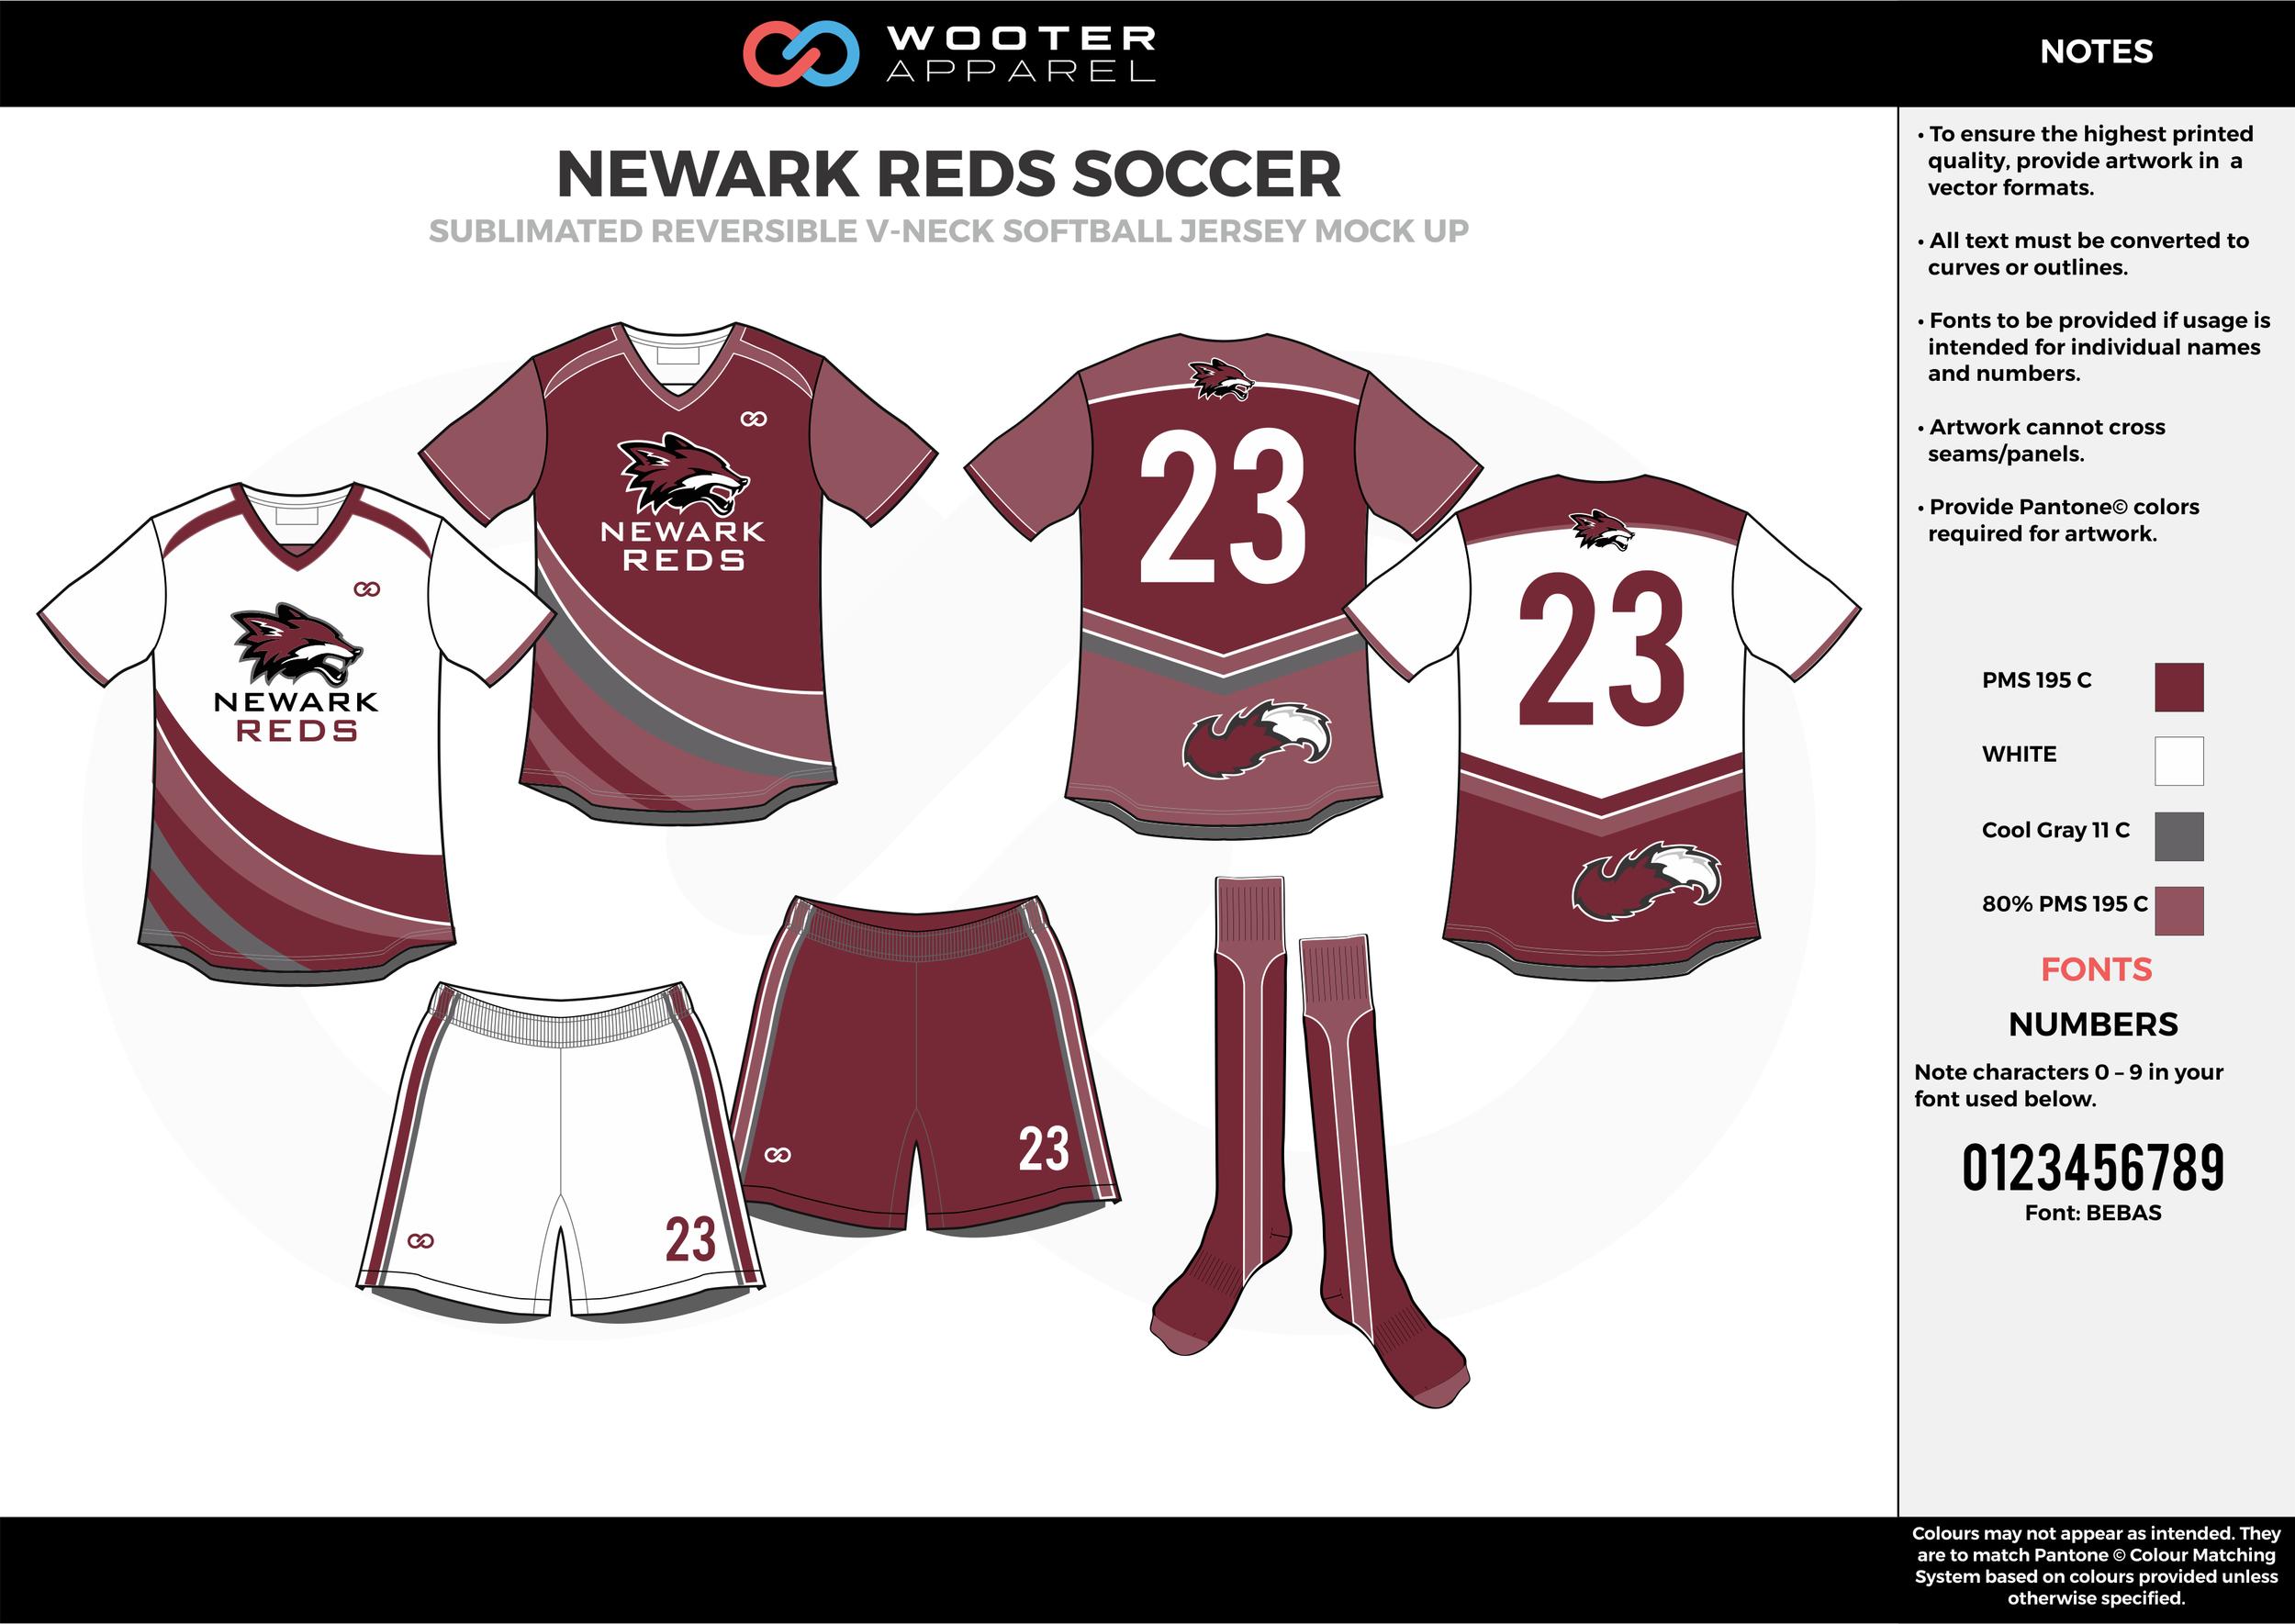 NEWARK REDS wine red white gray custom sublimated soccer uniform jersey shirt shorts socks